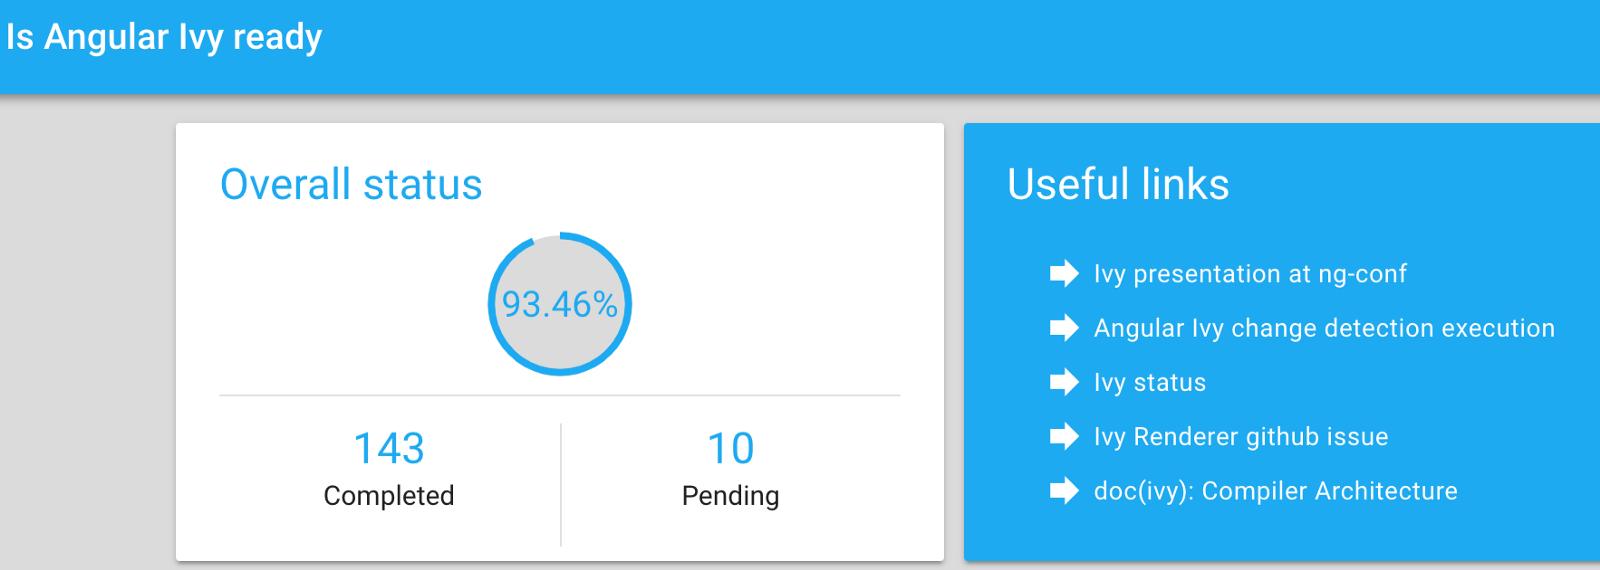 Angular Ivy Deployment Status